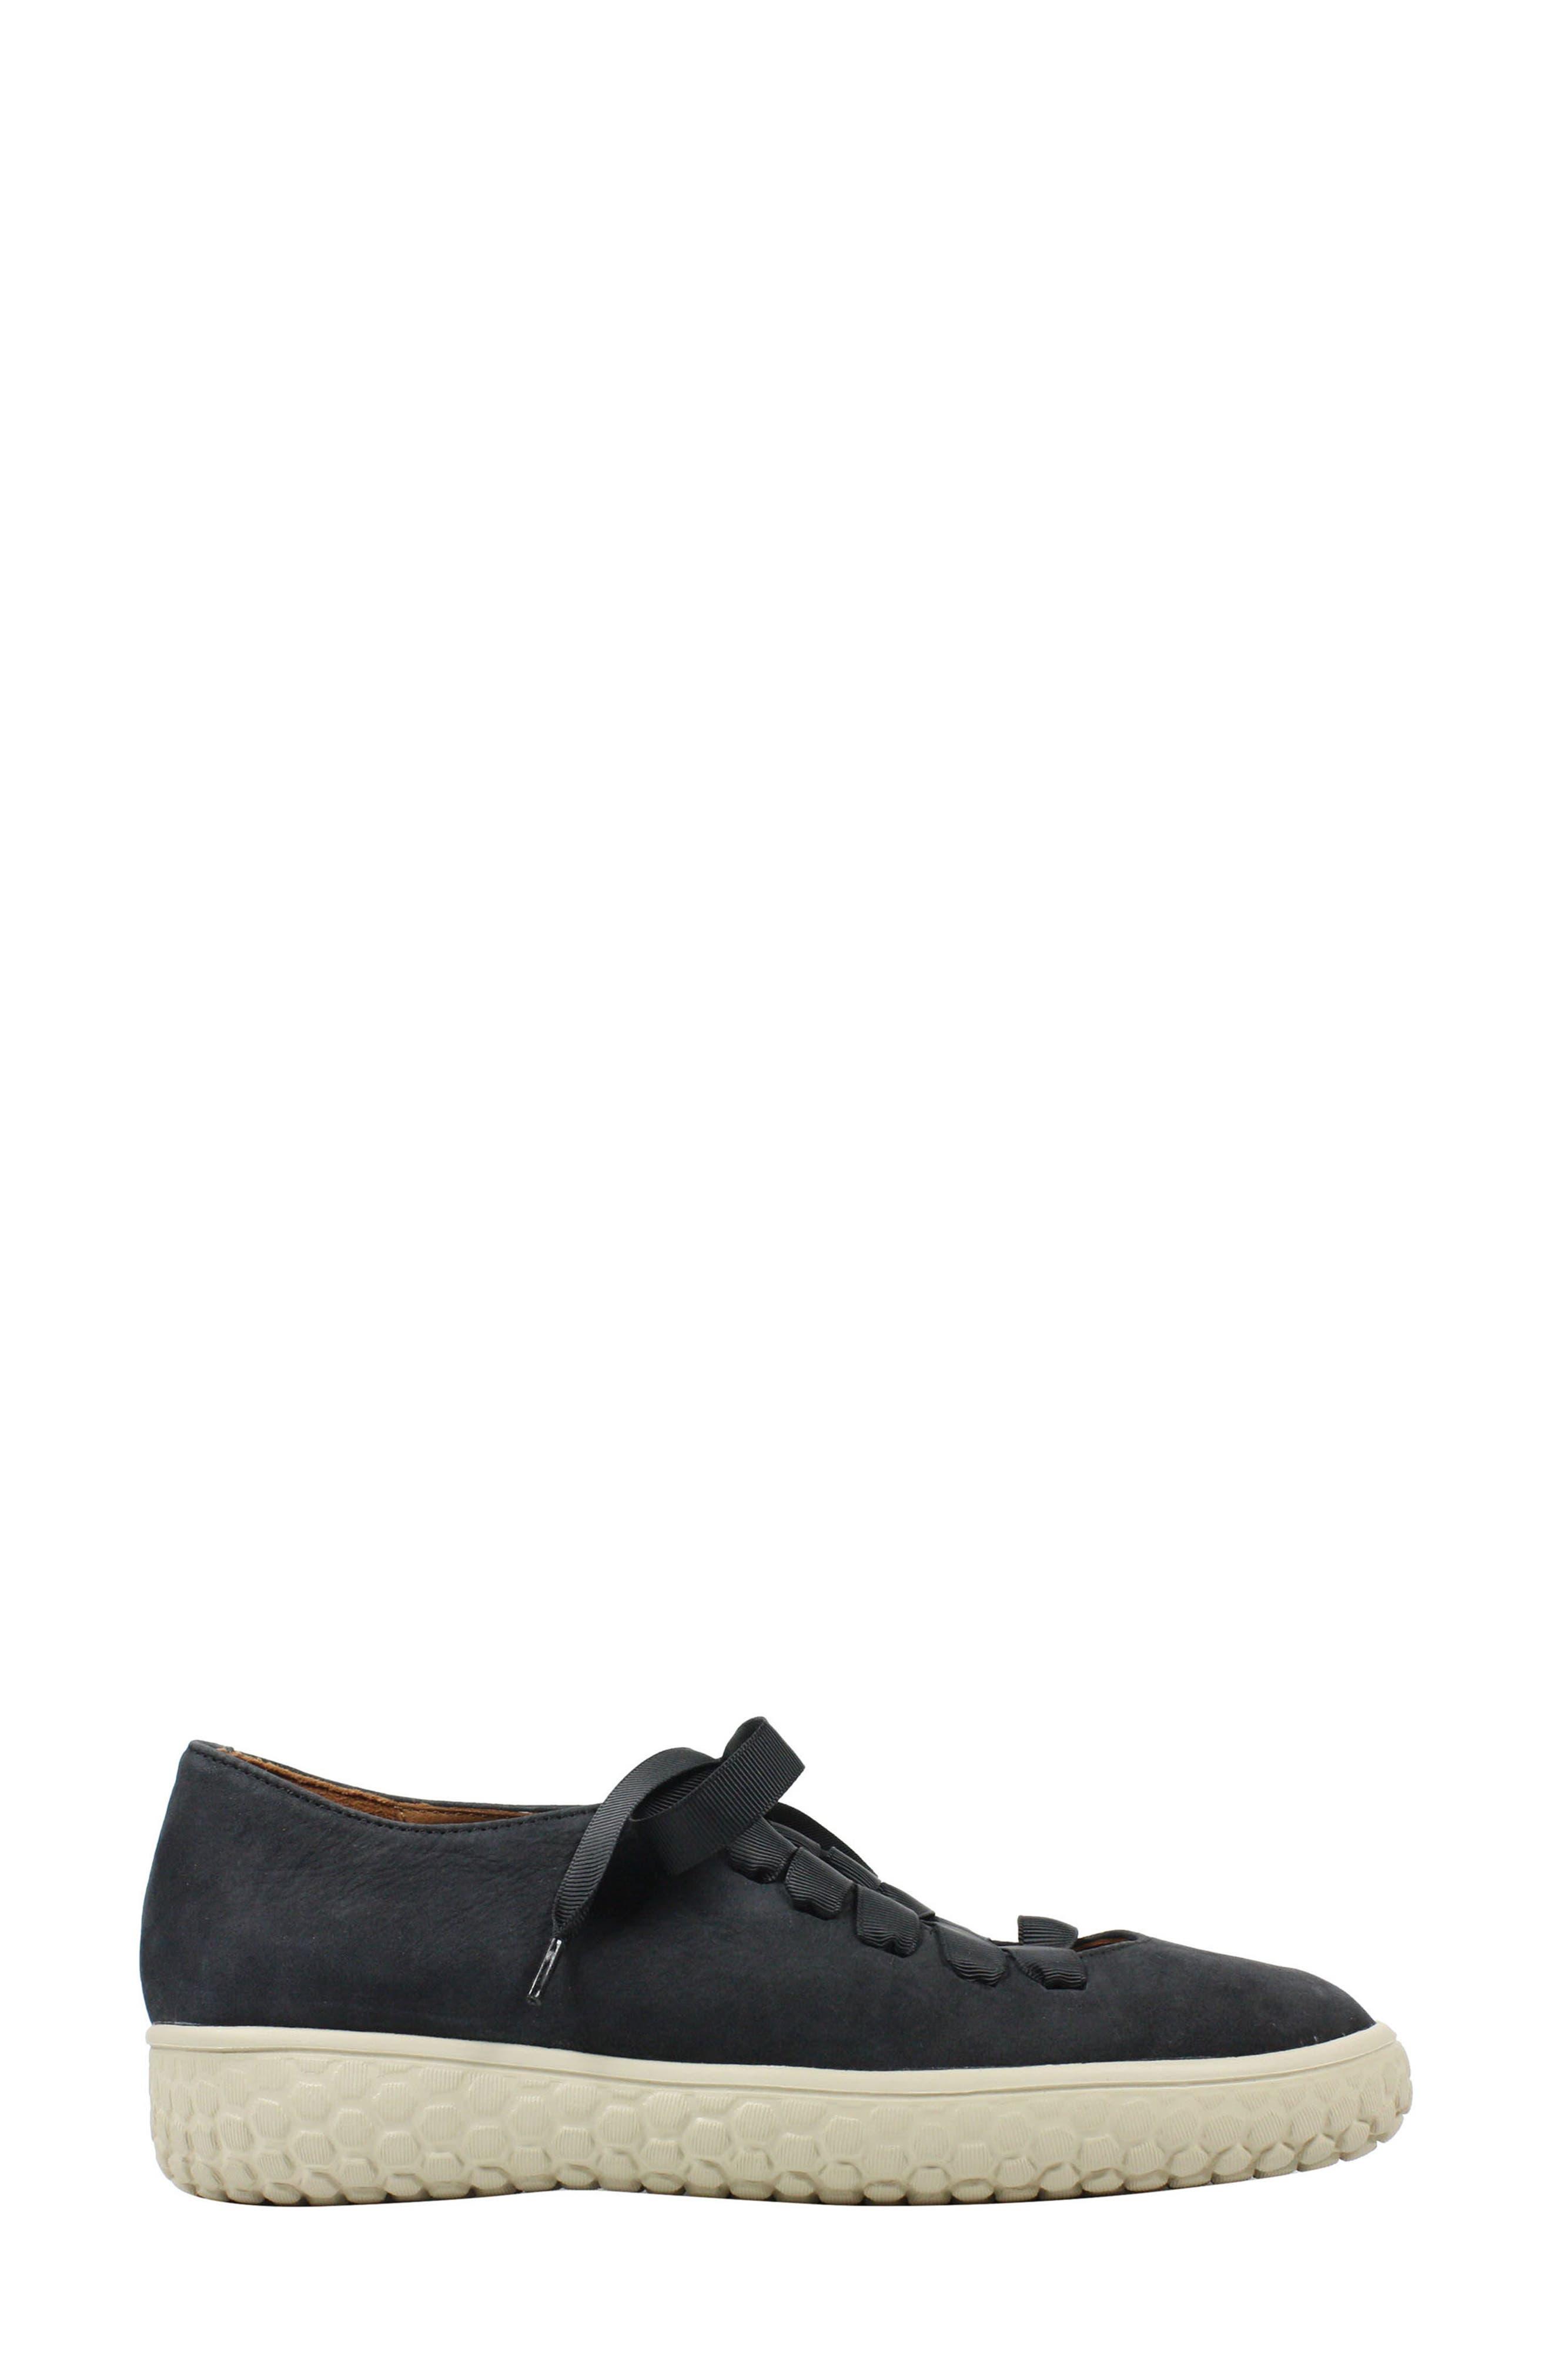 Zaheera Sneaker,                             Alternate thumbnail 3, color,                             BLACK NUBUCK LEATHER